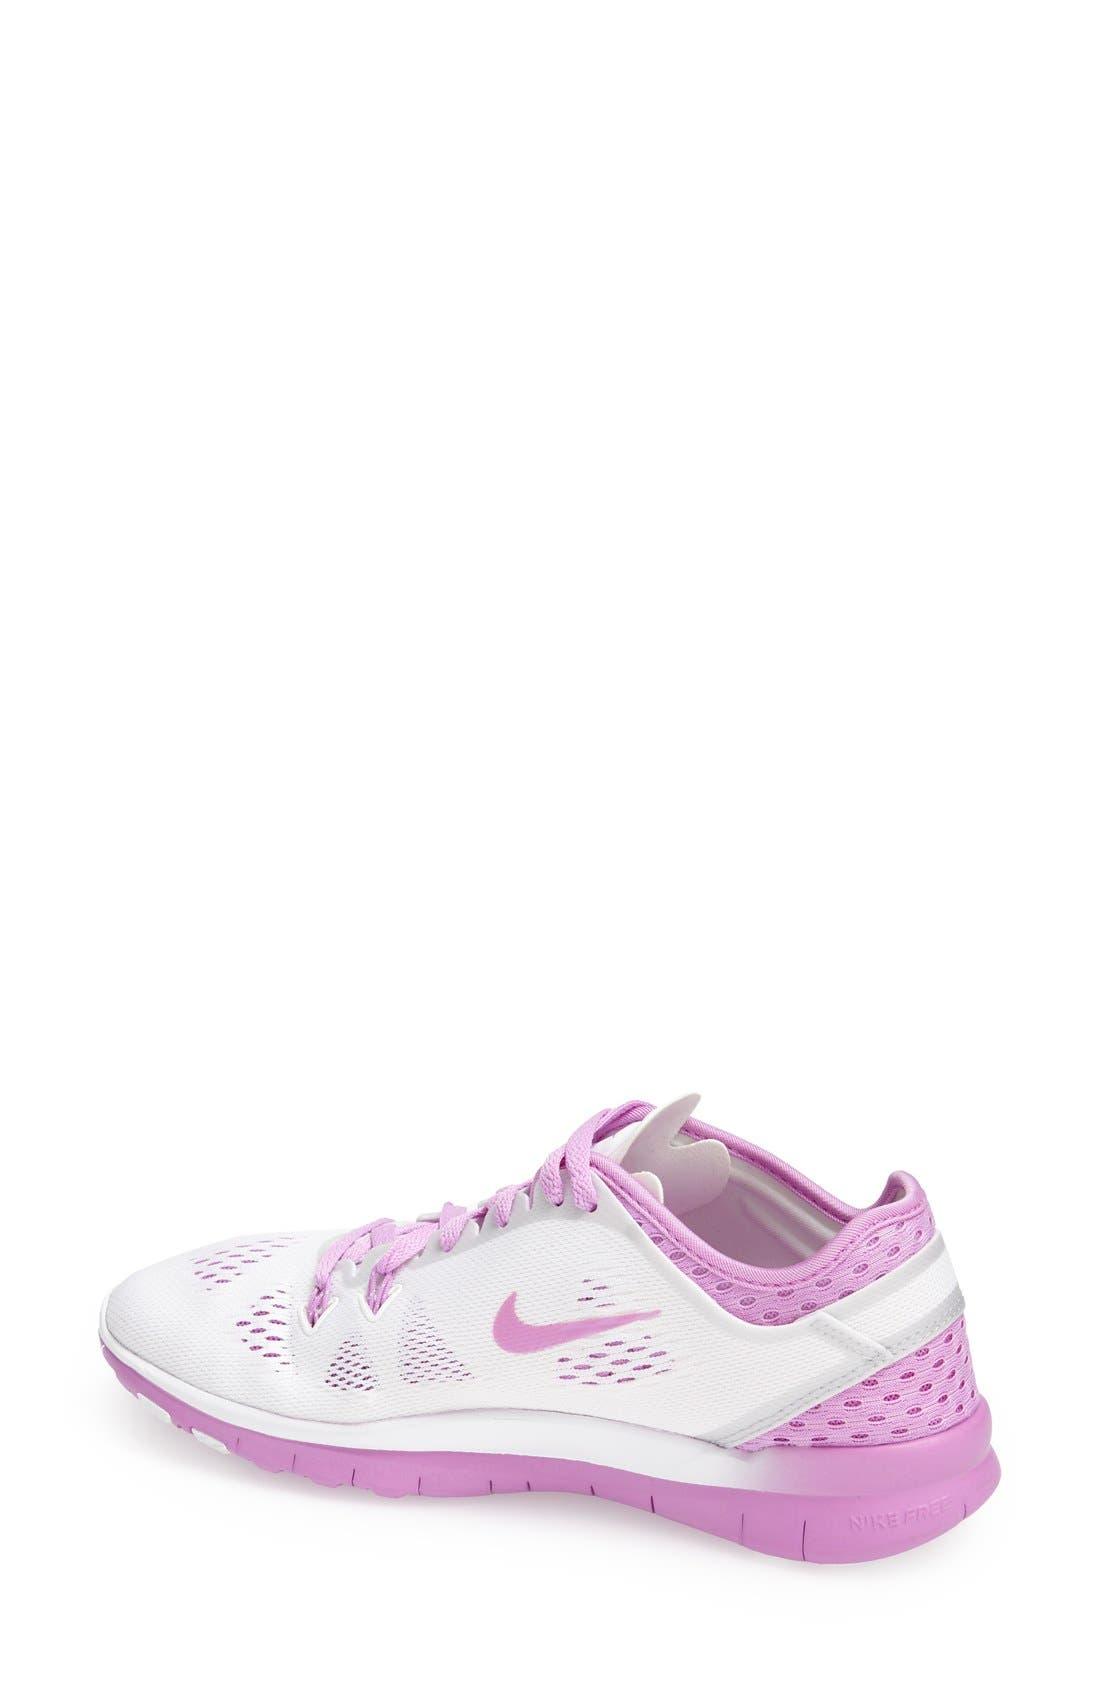 Alternate Image 2  - Nike 'Free 5.0 TR Fit 5 Breathe' Training Shoe (Women)